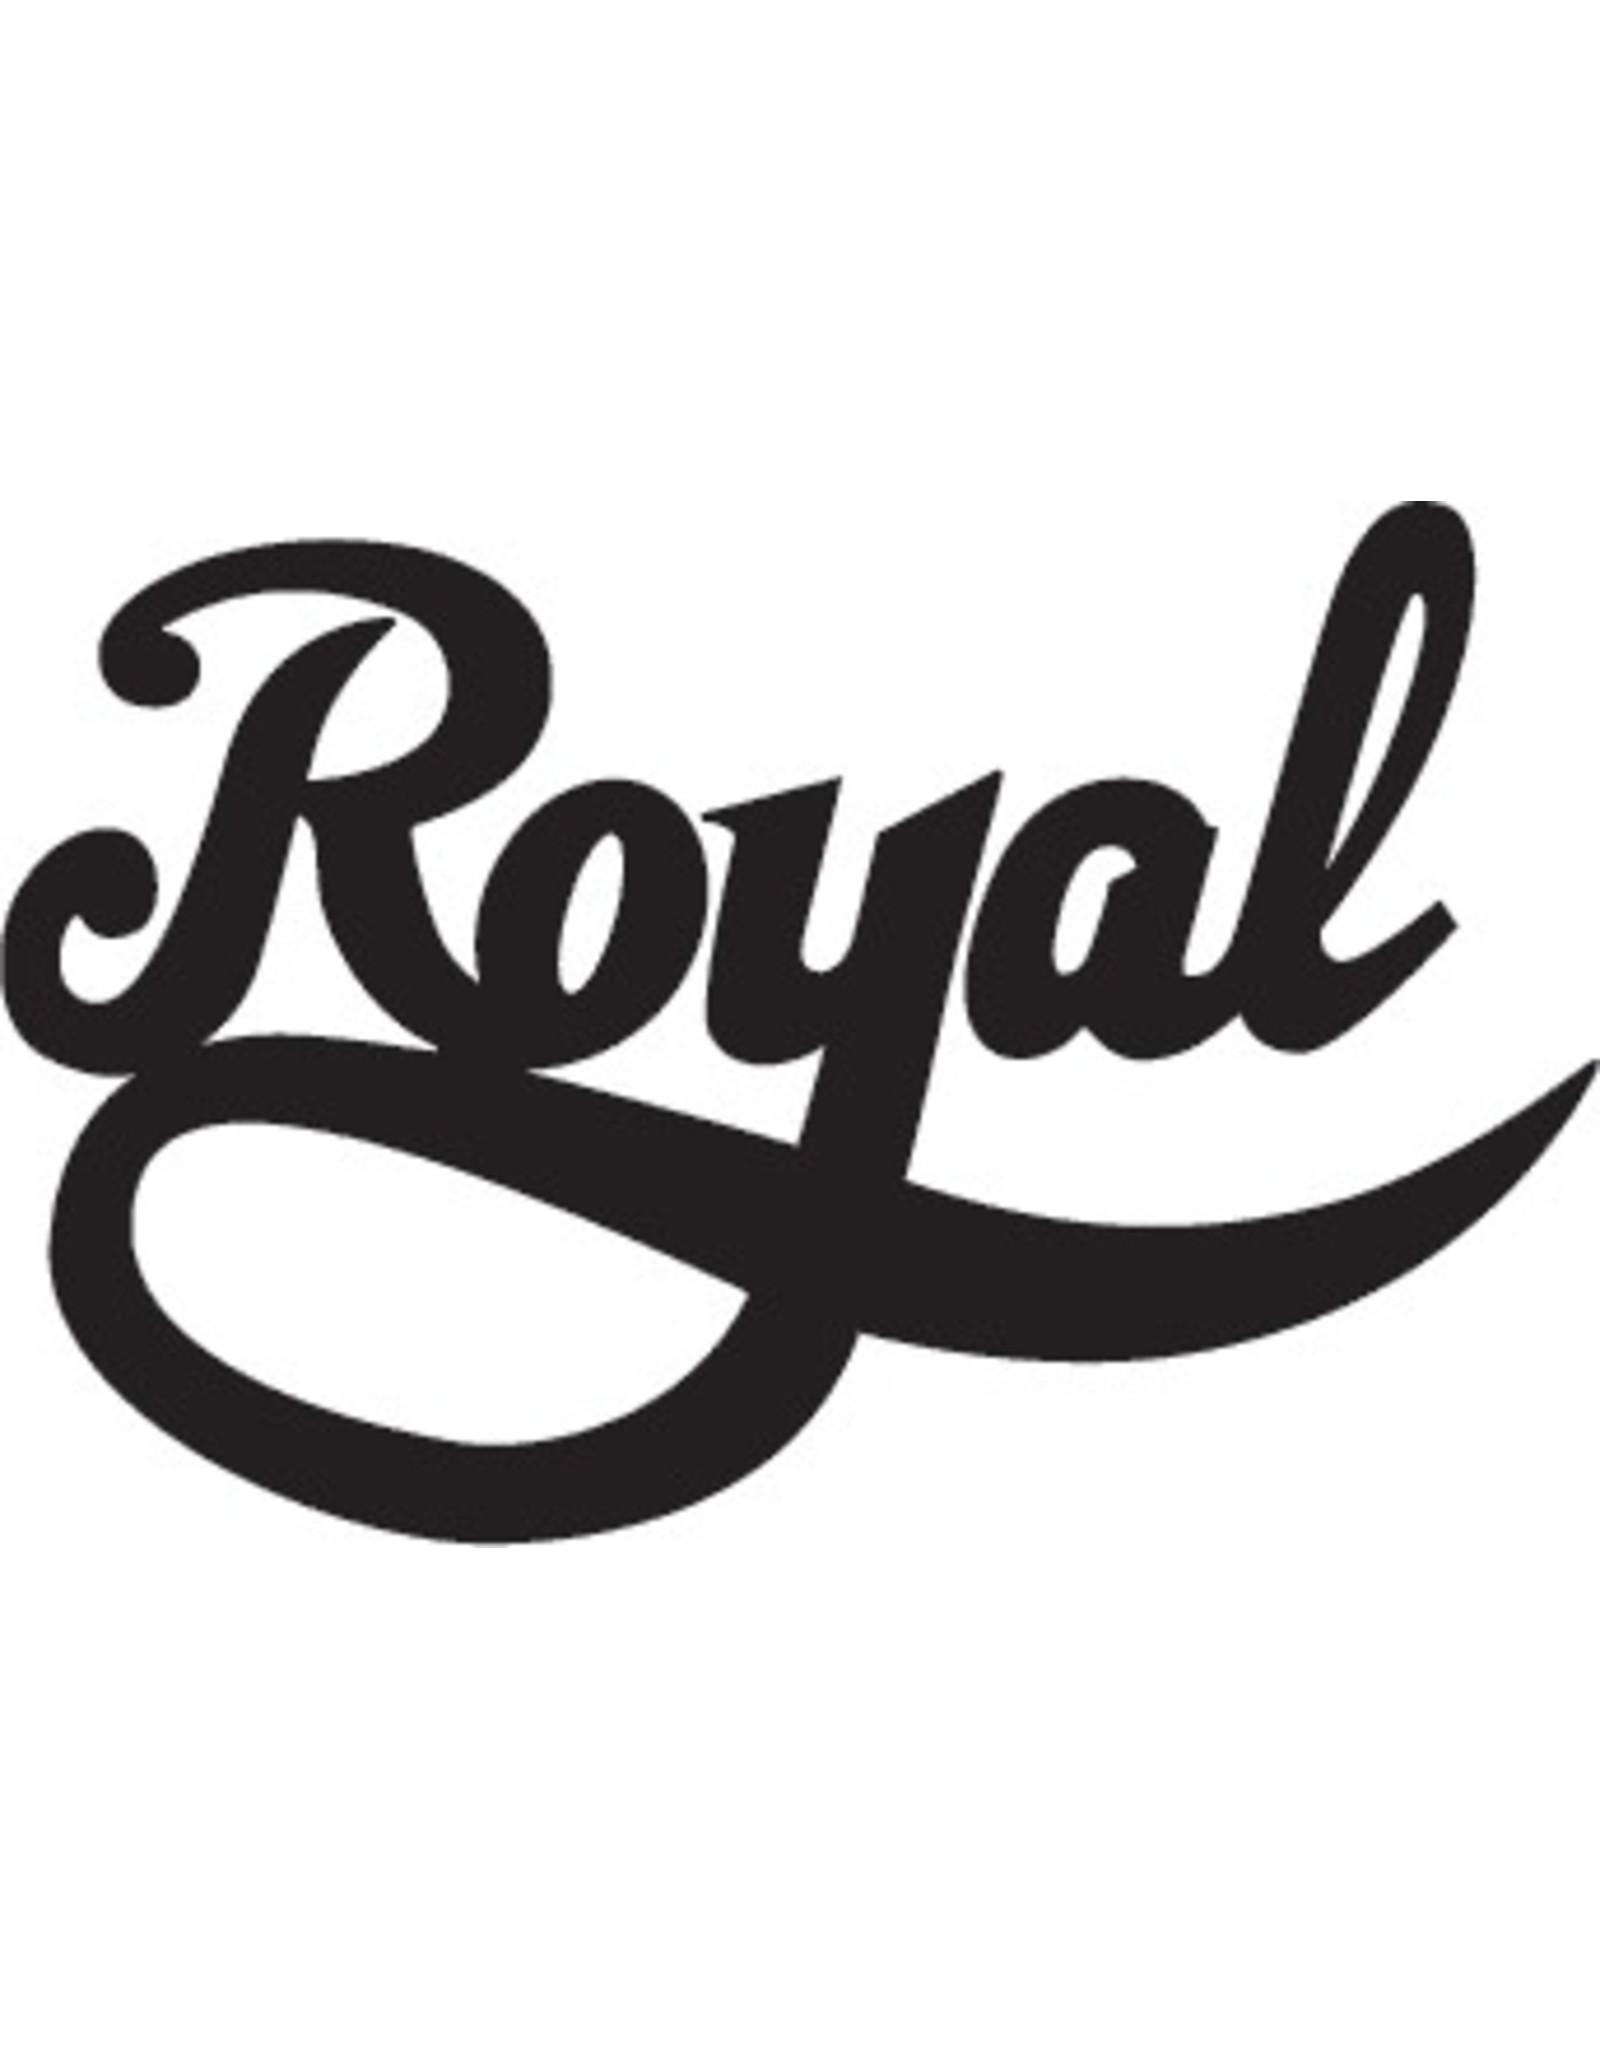 Royal Royal Trucks